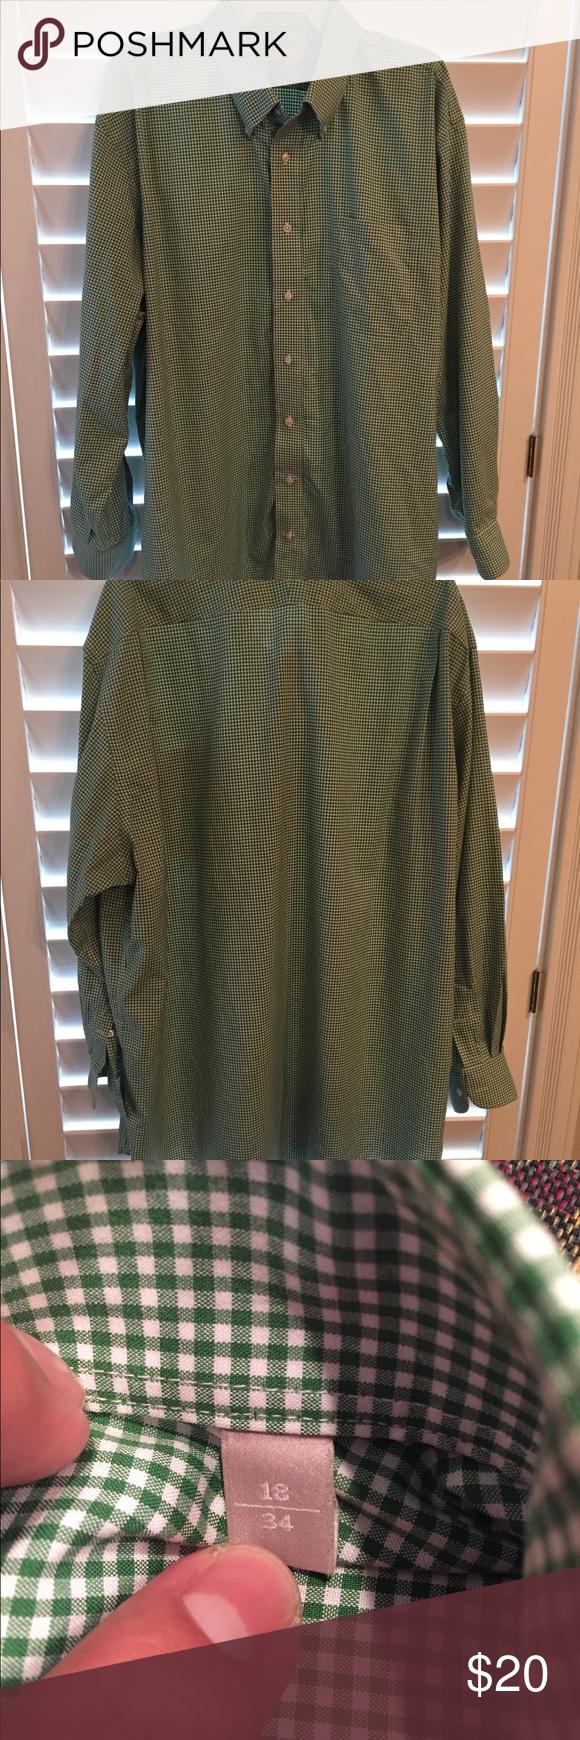 Green checkered dress shirt  Menus Nordstrom  Green and white dress shirt  My Posh Picks